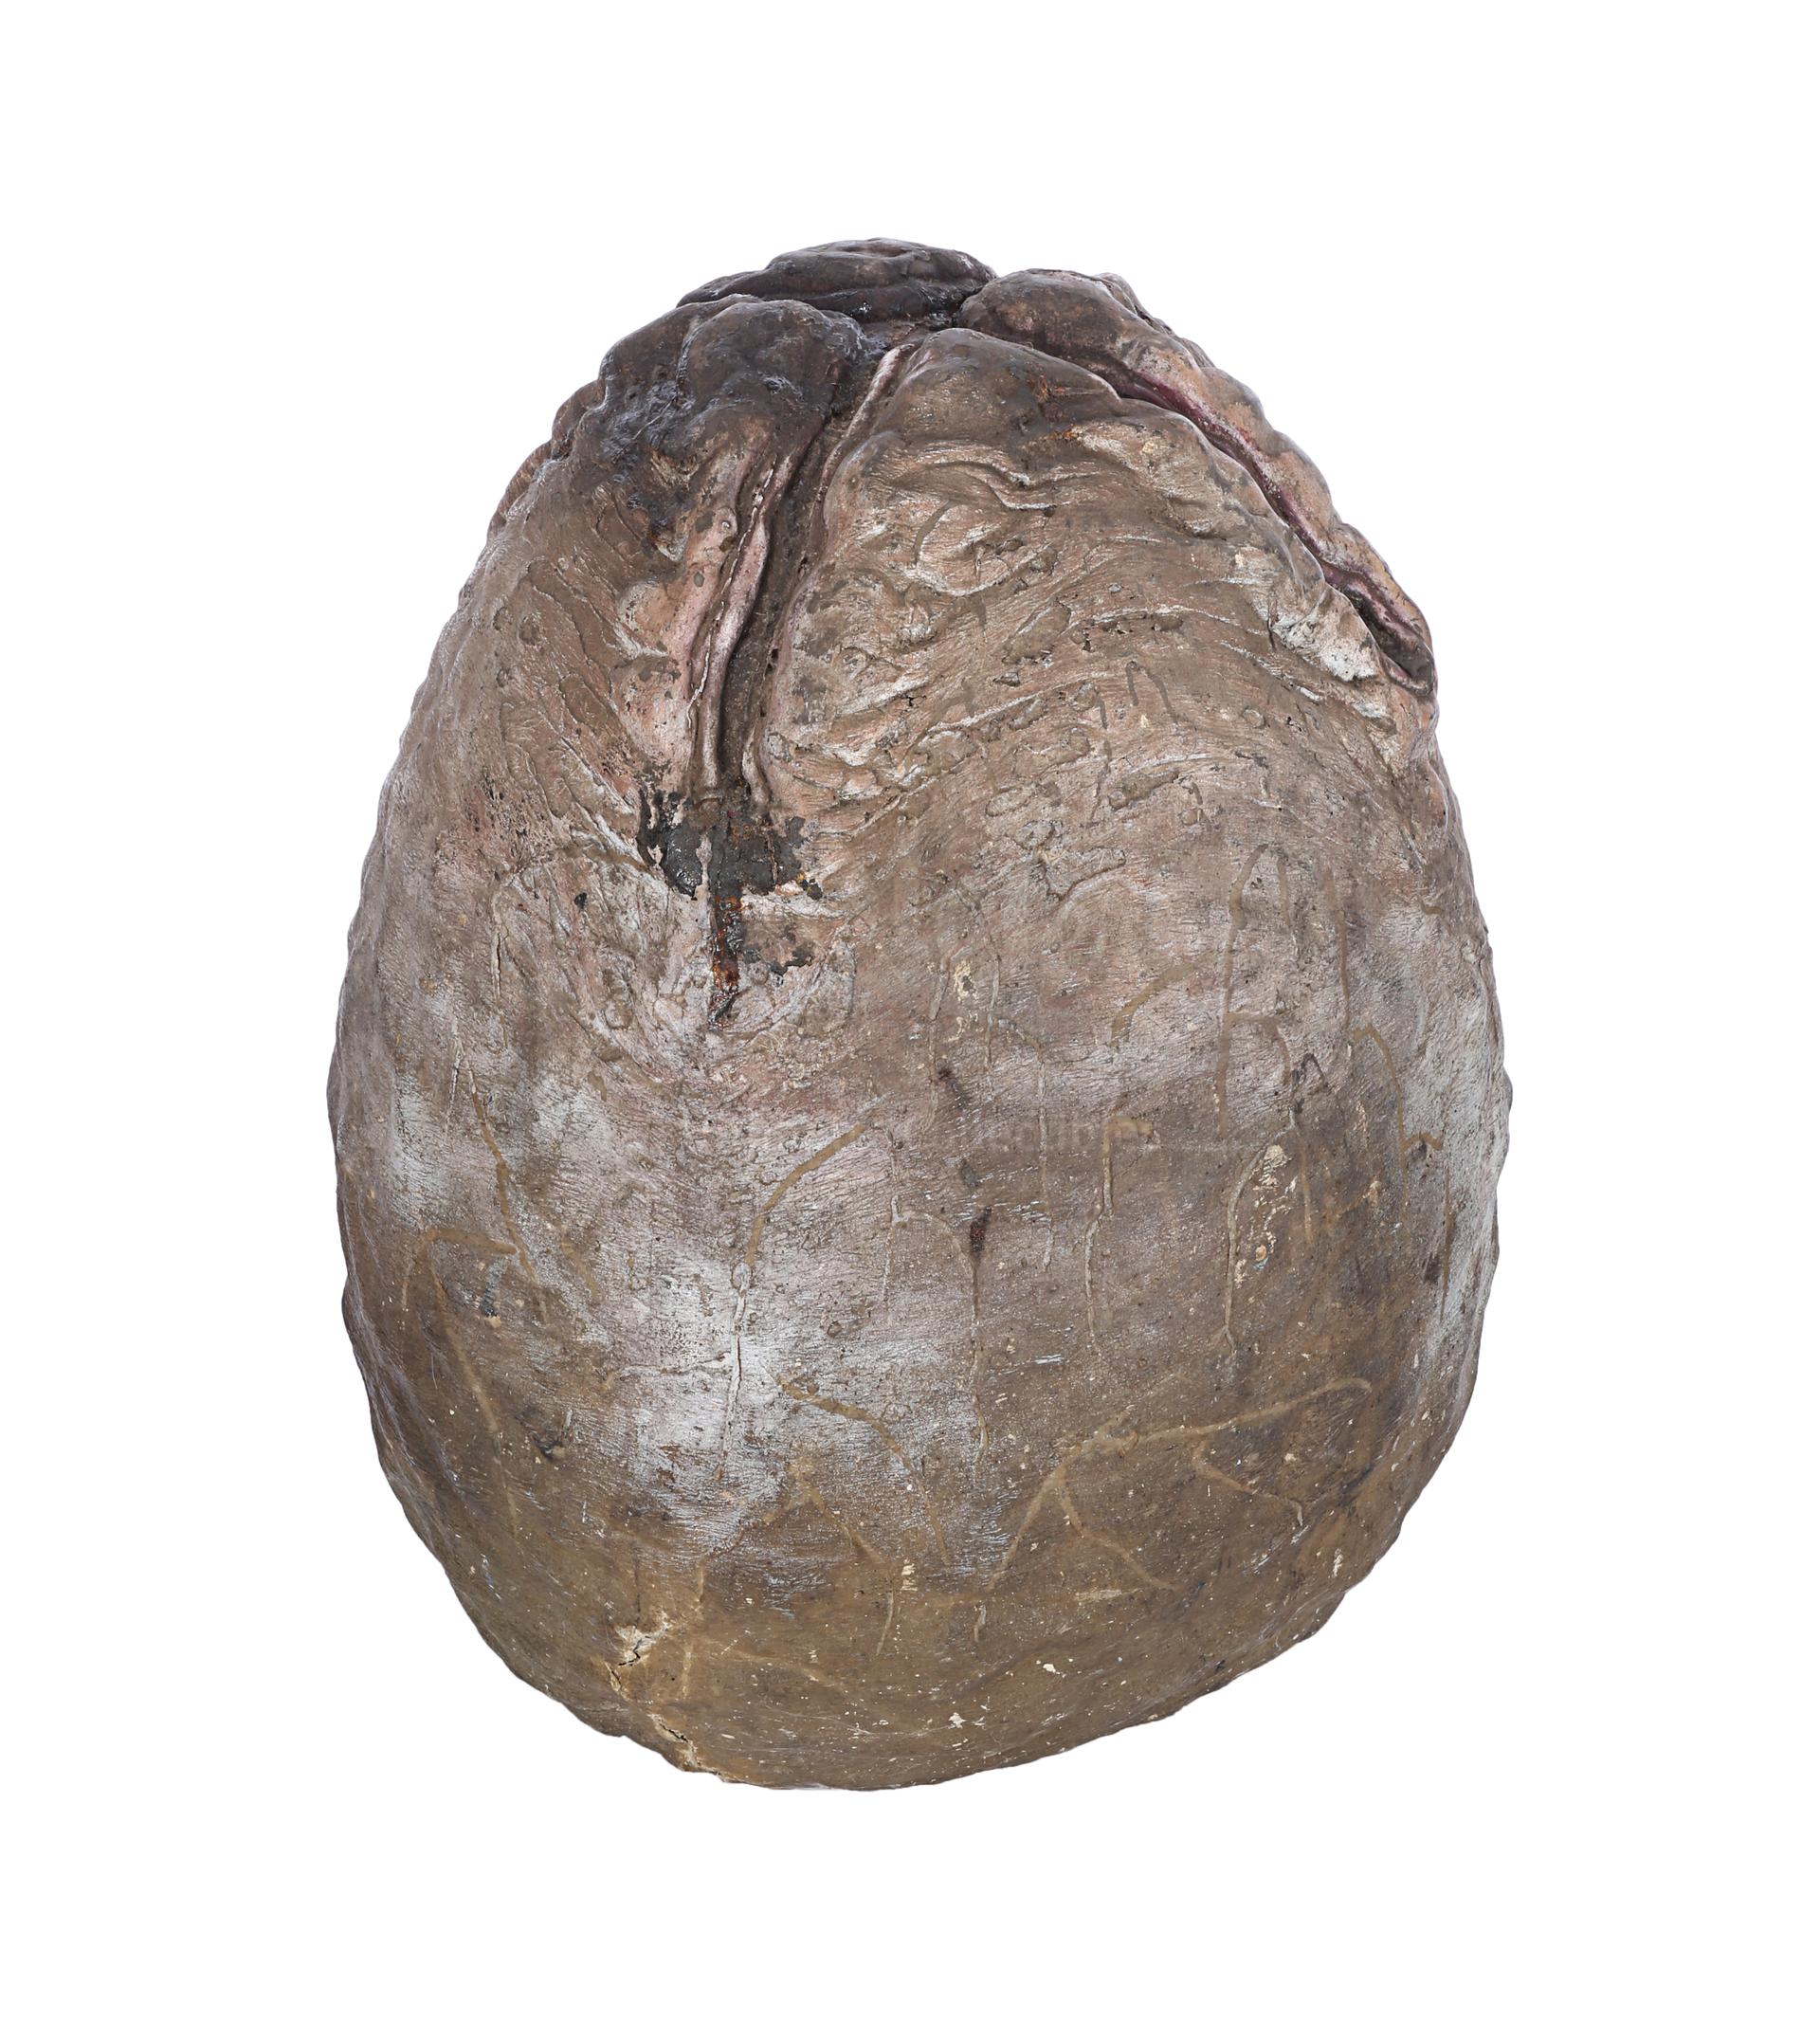 ALIENS (1986) - Xenomorph Egg - Image 2 of 14